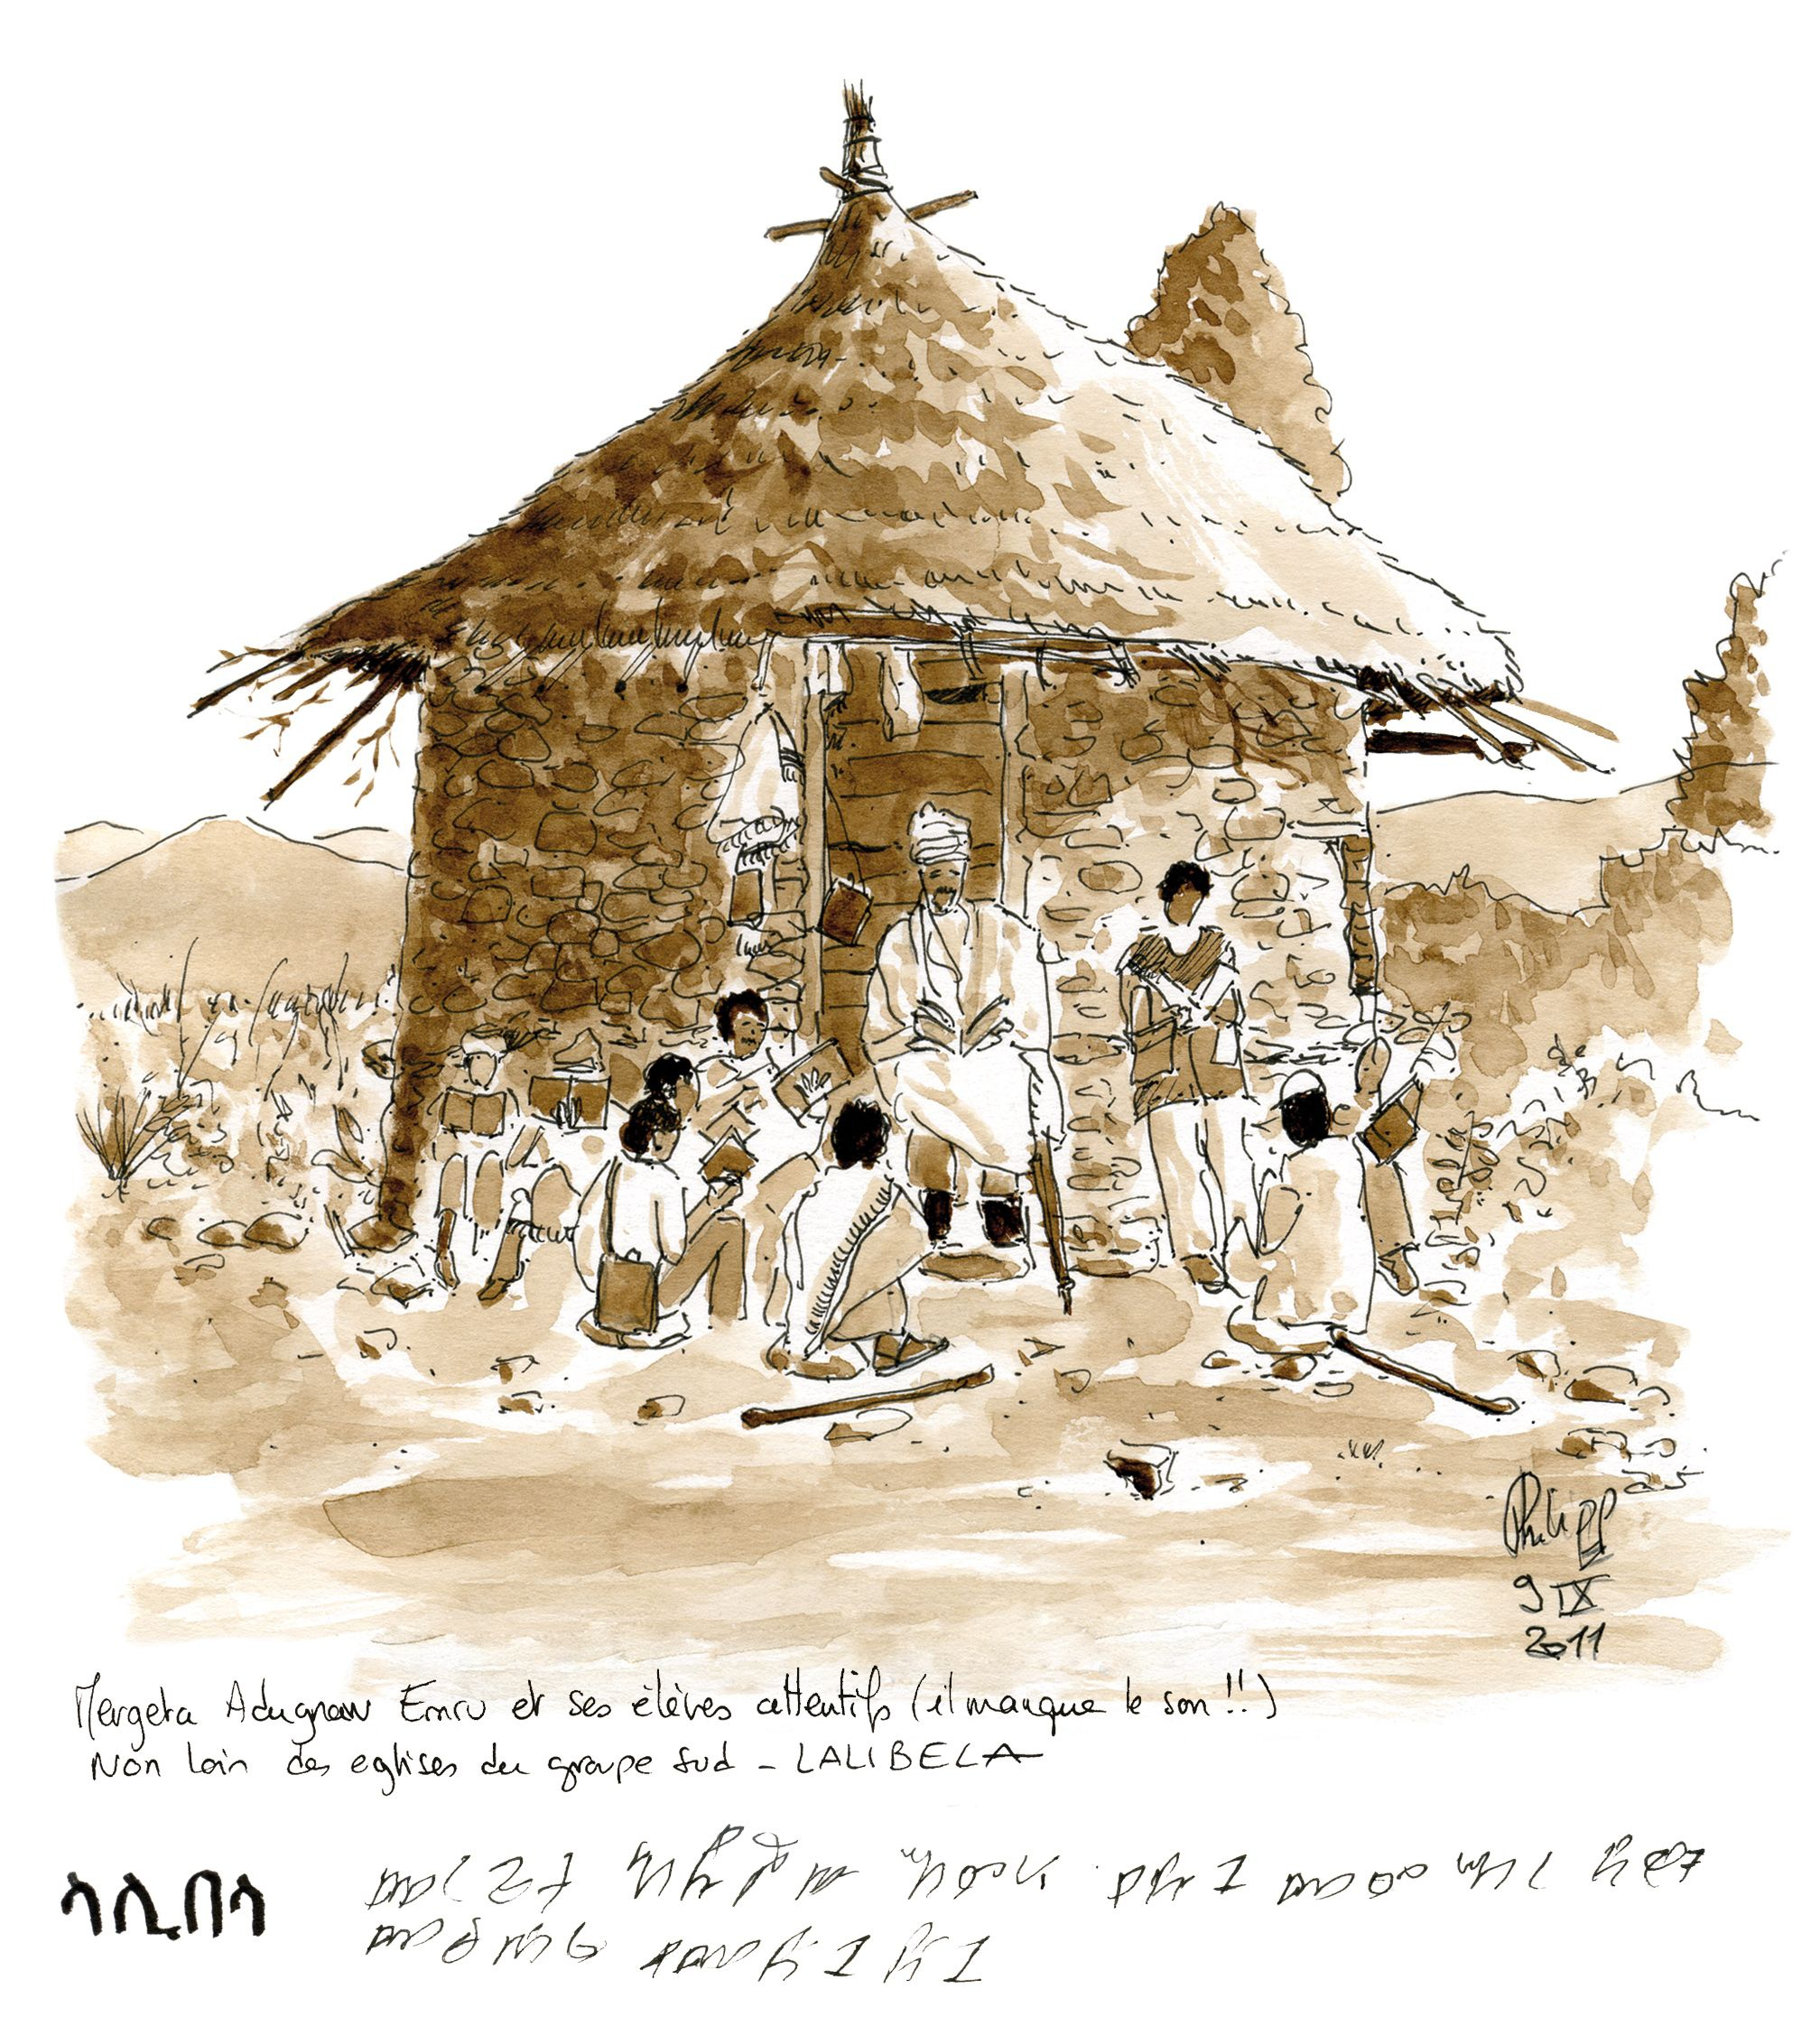 librairie,ulyssse,catherine domain,carnets de voyage,hendaye,ethiopie,prix,pierre loti,philippe bichon,globecroqueur